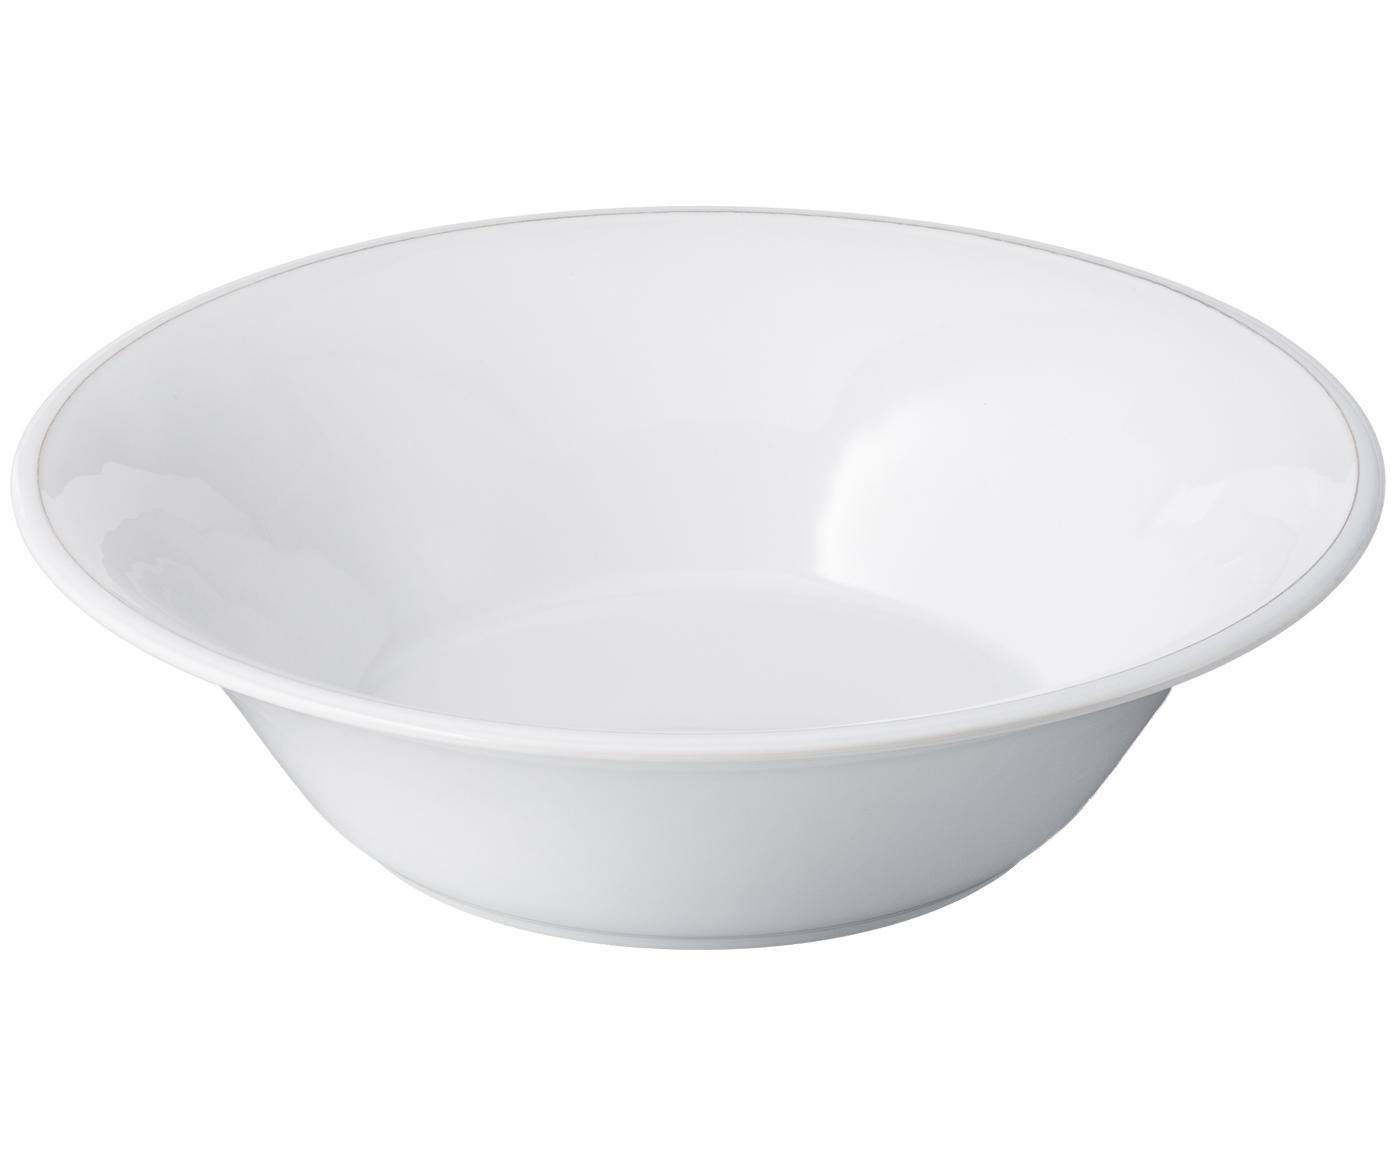 Saladeschaal Constance, Keramiek, Wit, Ø 30 x H 9 cm